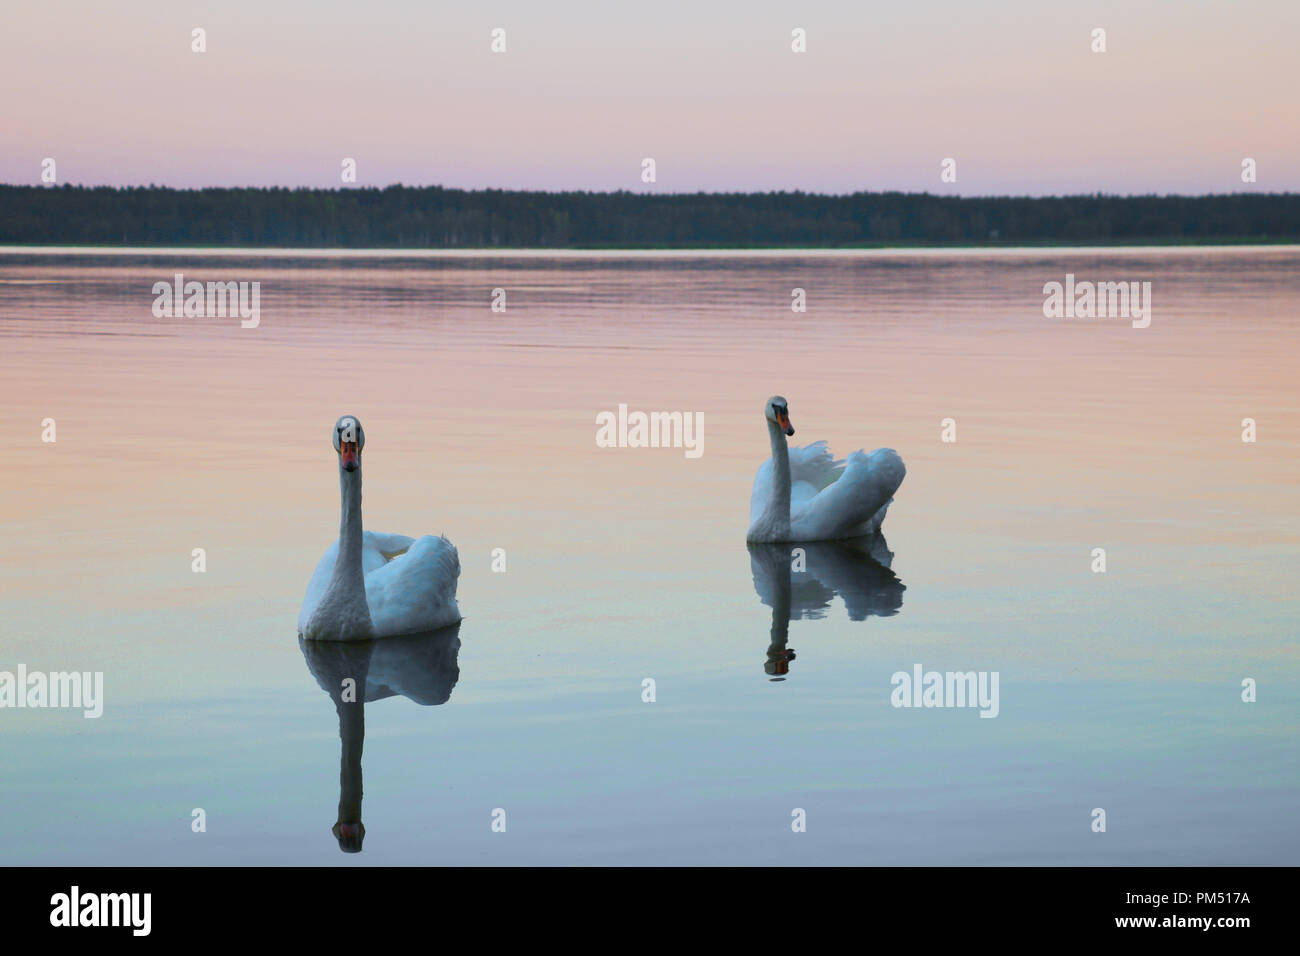 Beautiful swans swim on the lake during sunset, free space. Stock Photo